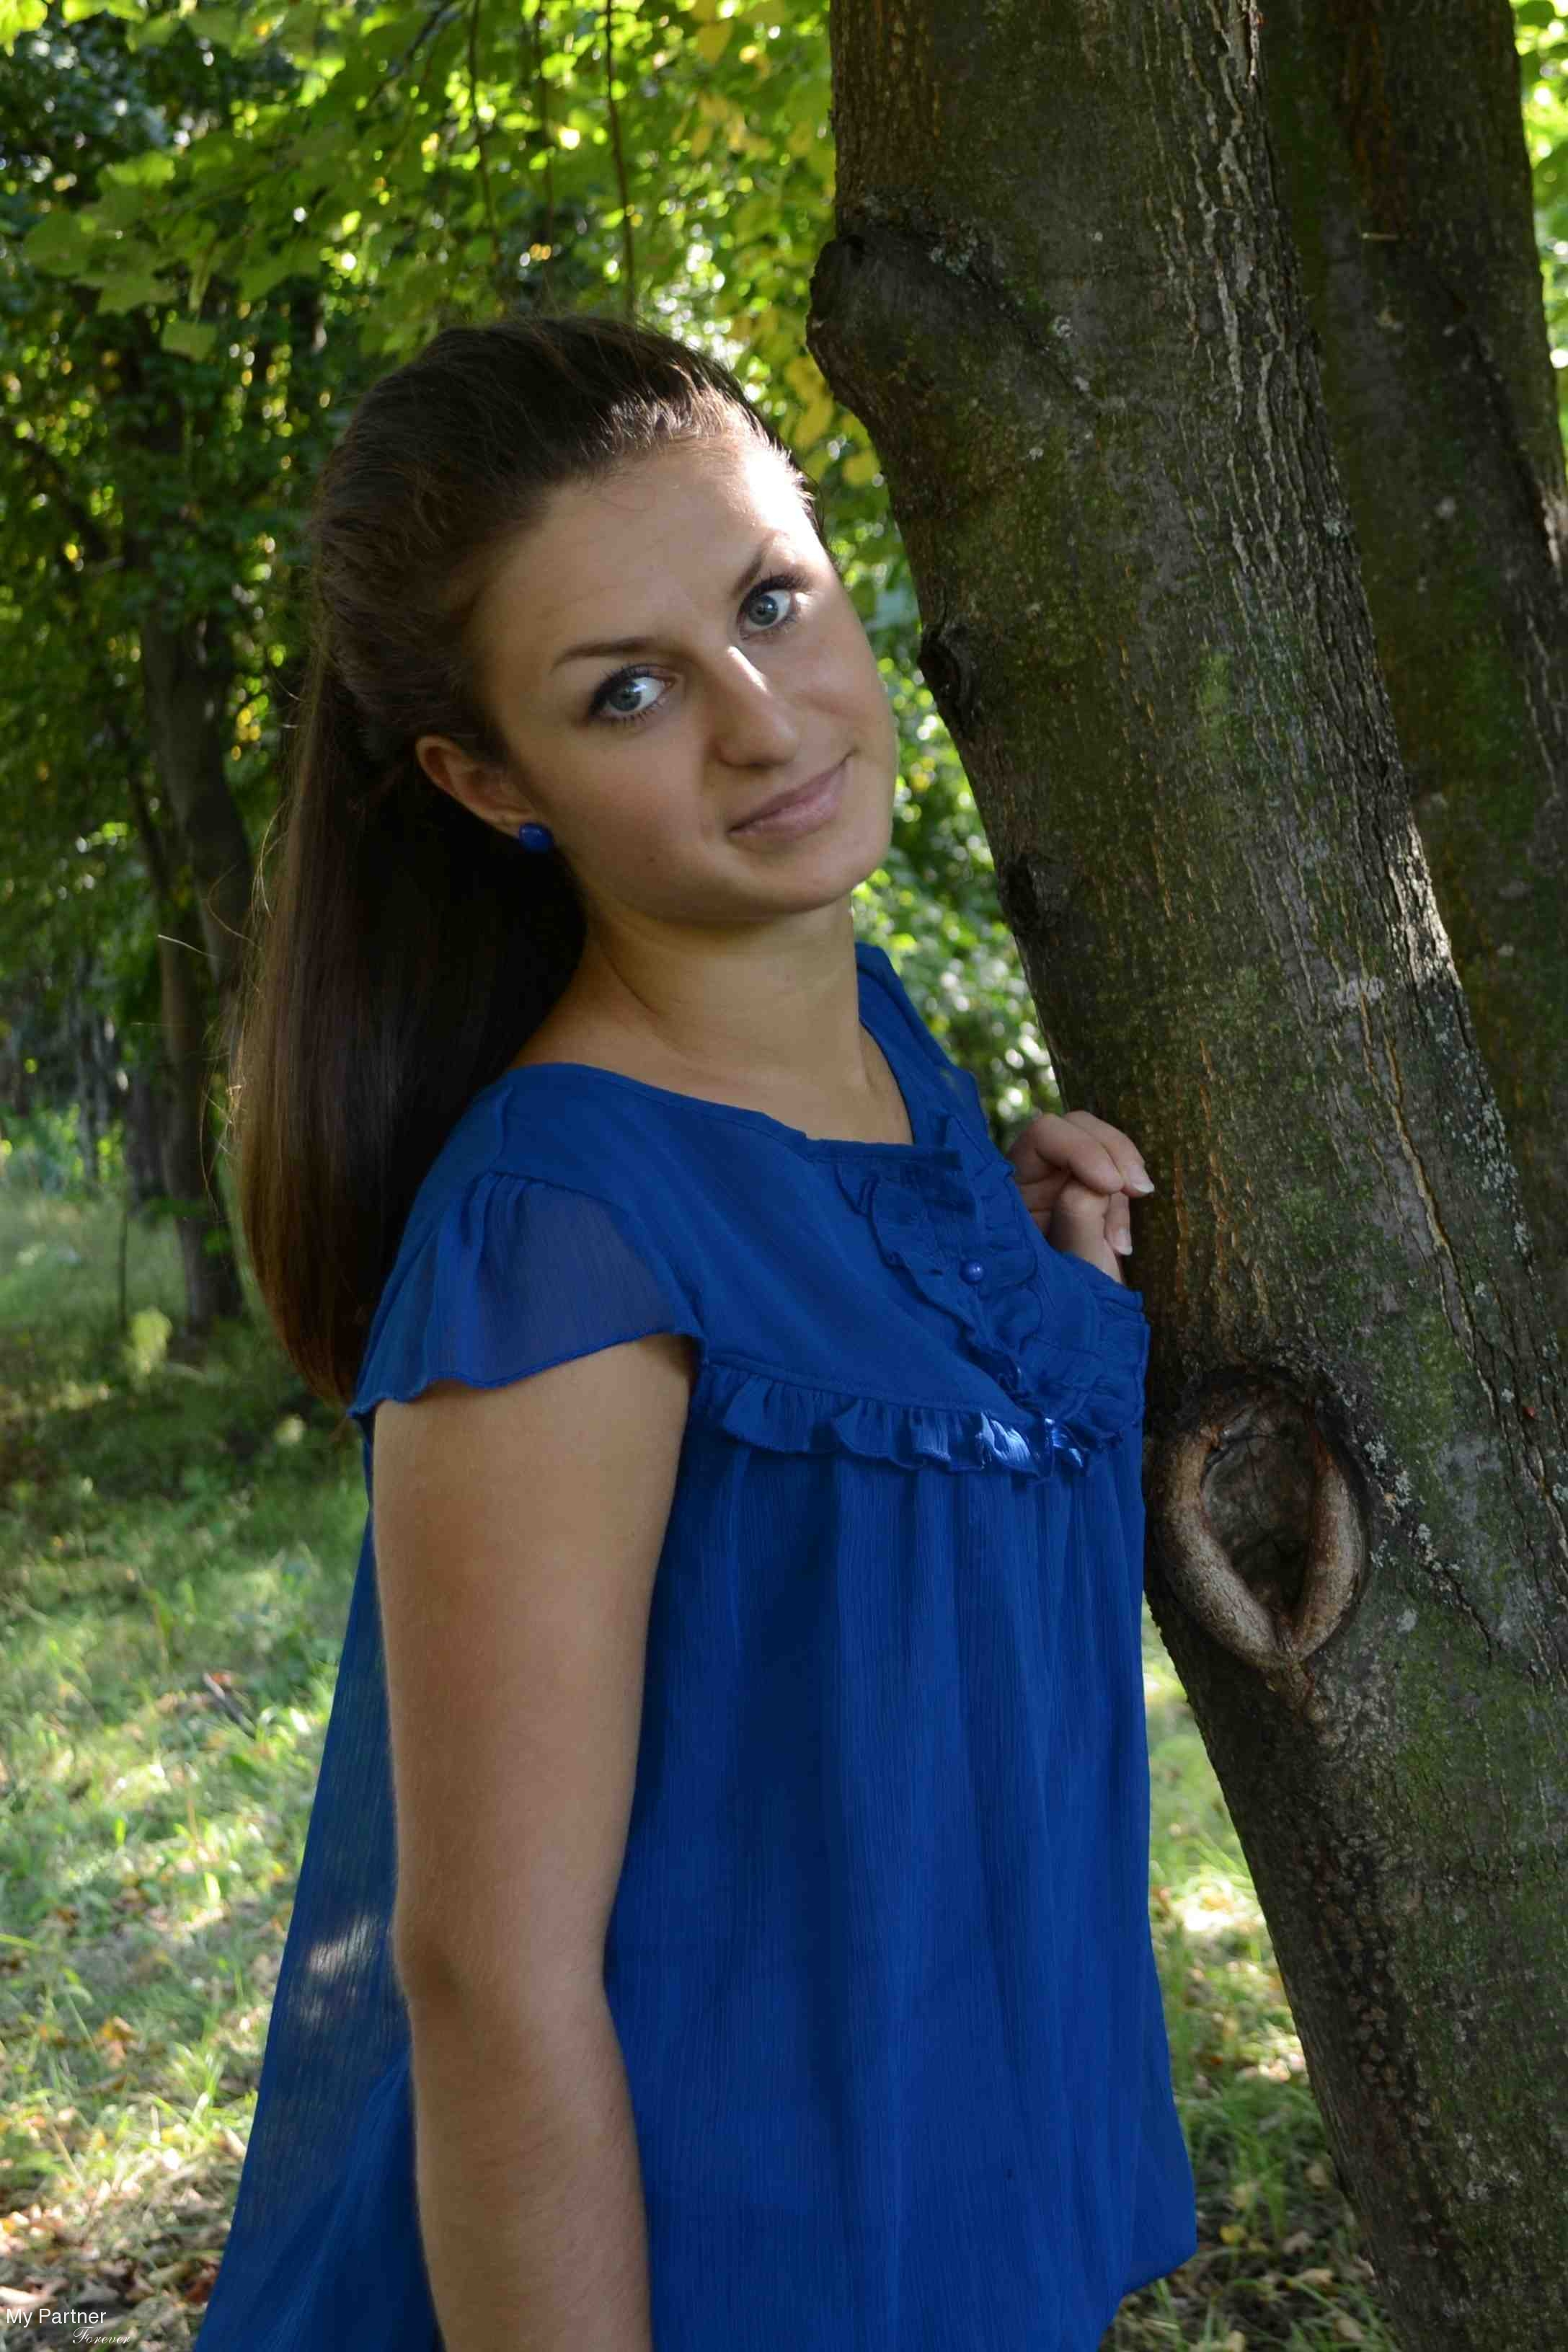 dating charming ukrainian girl